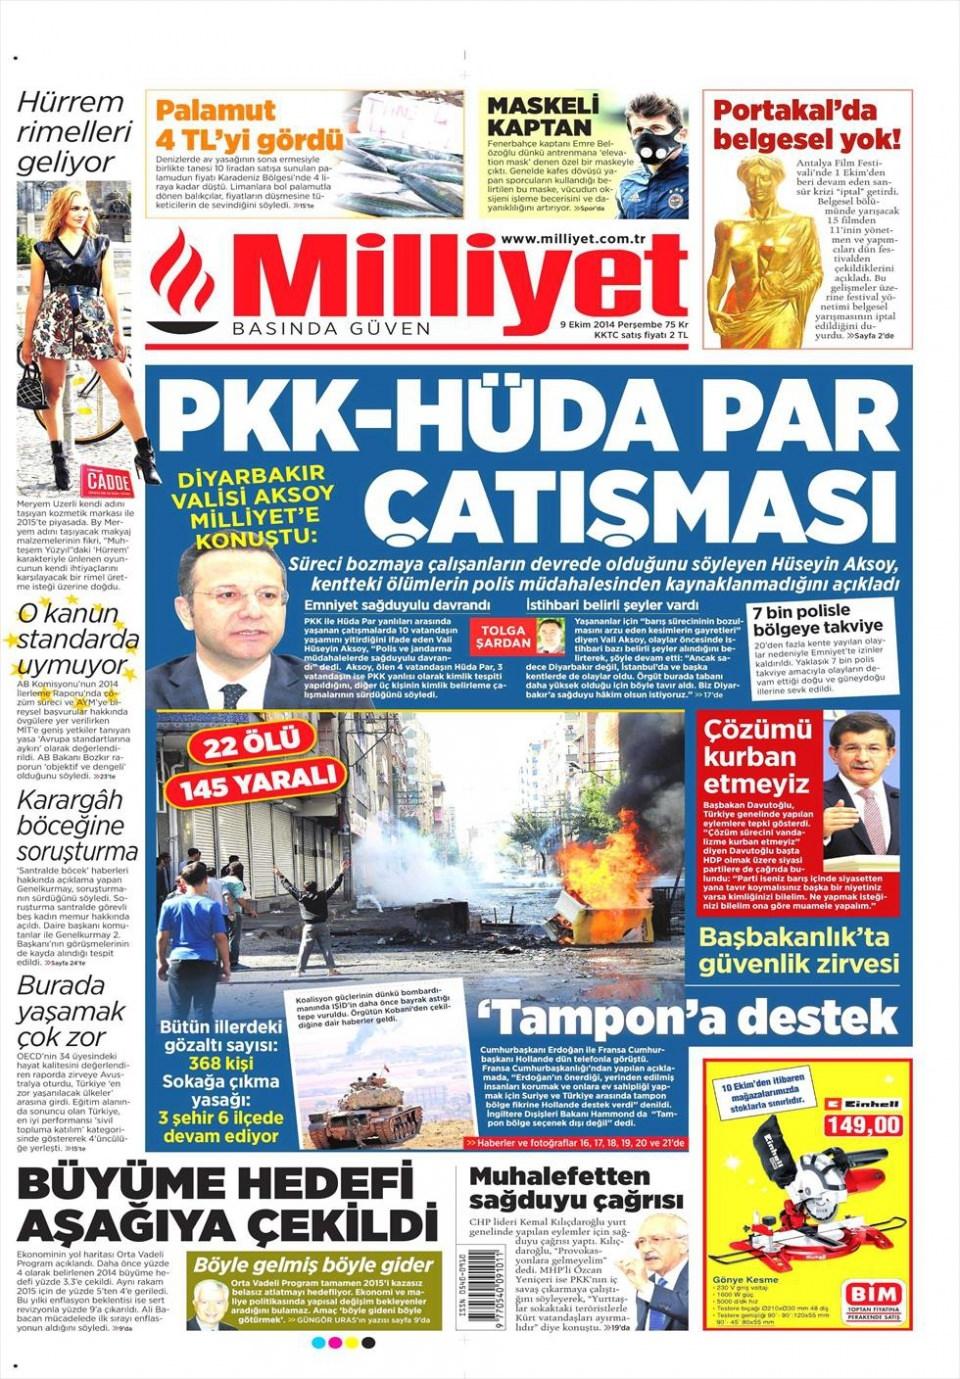 9 Ekim Gazete Manşetleri 12